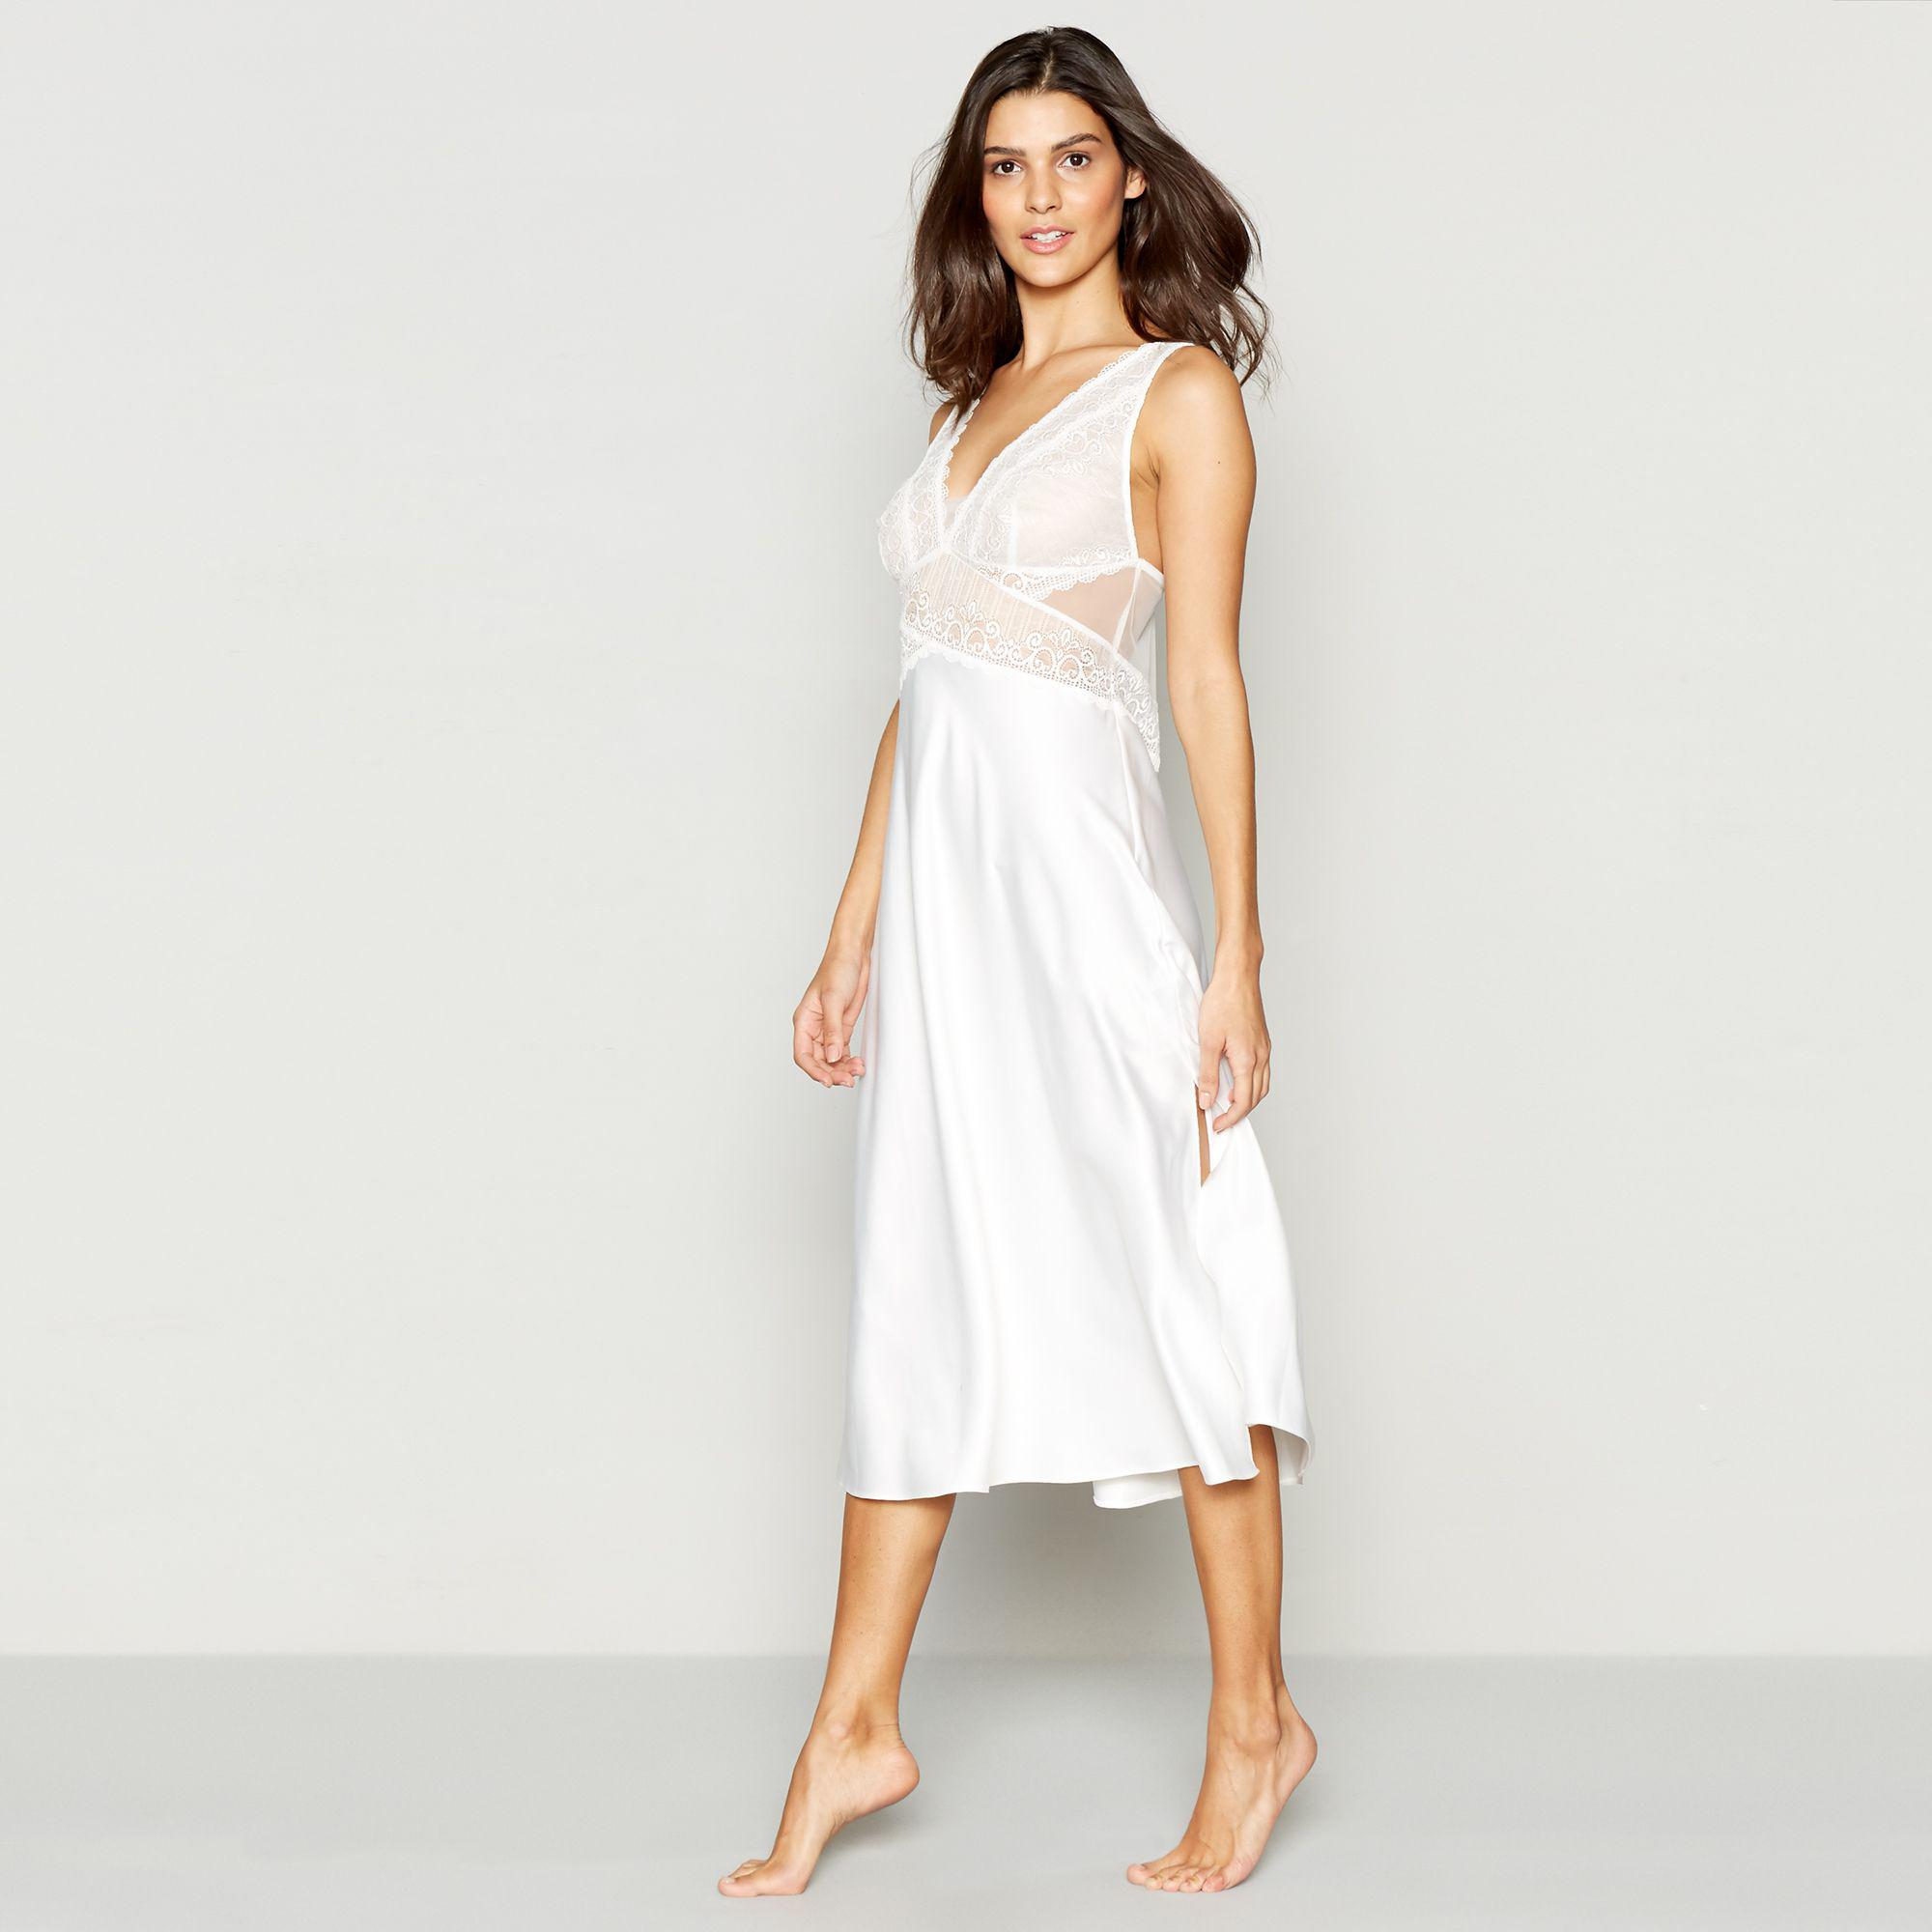 J By Jasper Conran Ivory Bridal Lace Nightdress in White - Lyst